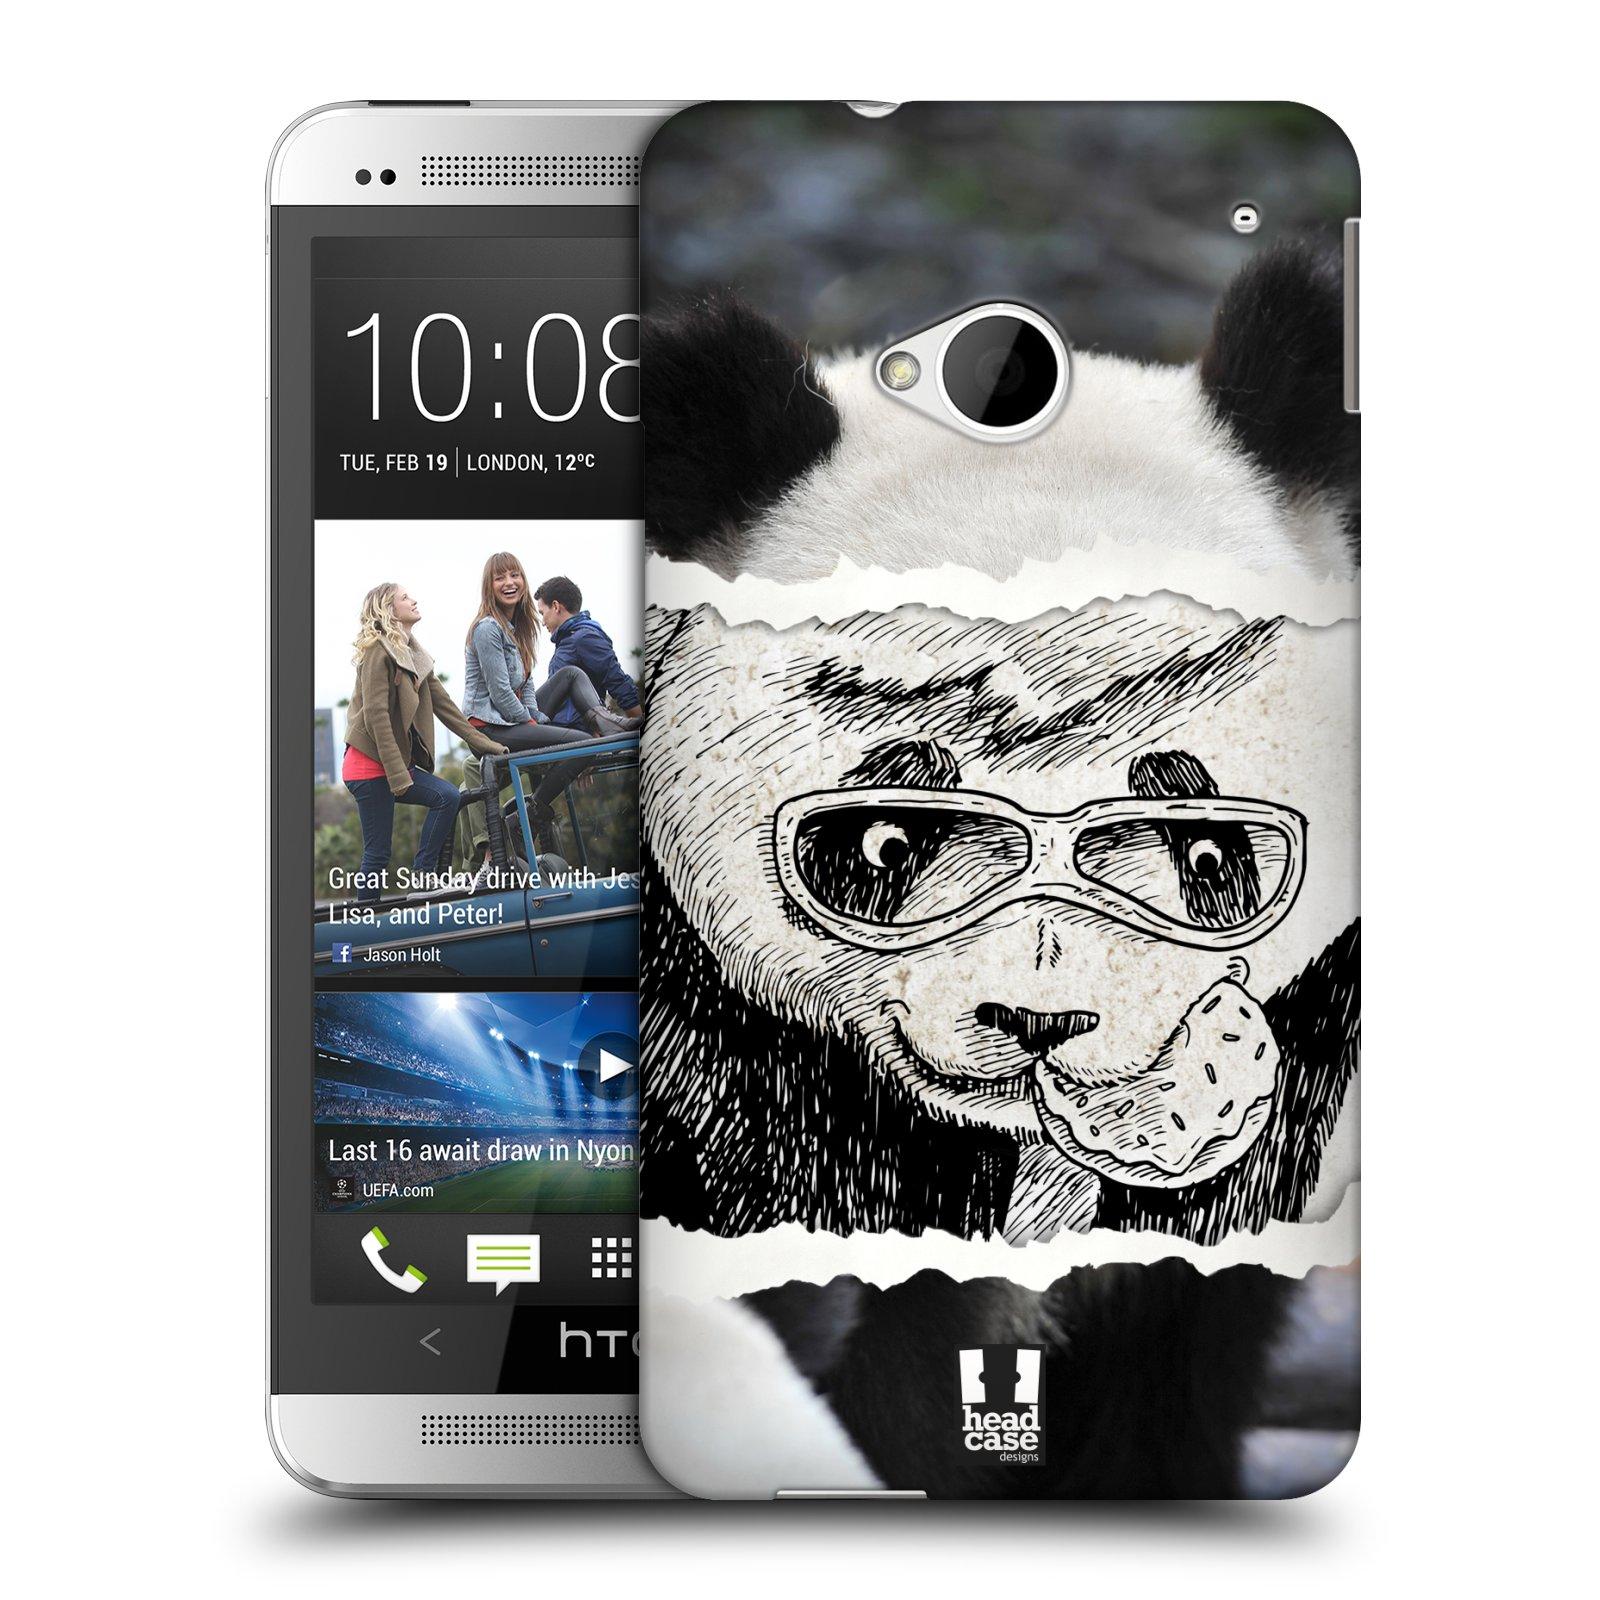 HEAD CASE plastový obal na mobil HTC One (M7) vzor zvířata koláž roztomilá panda